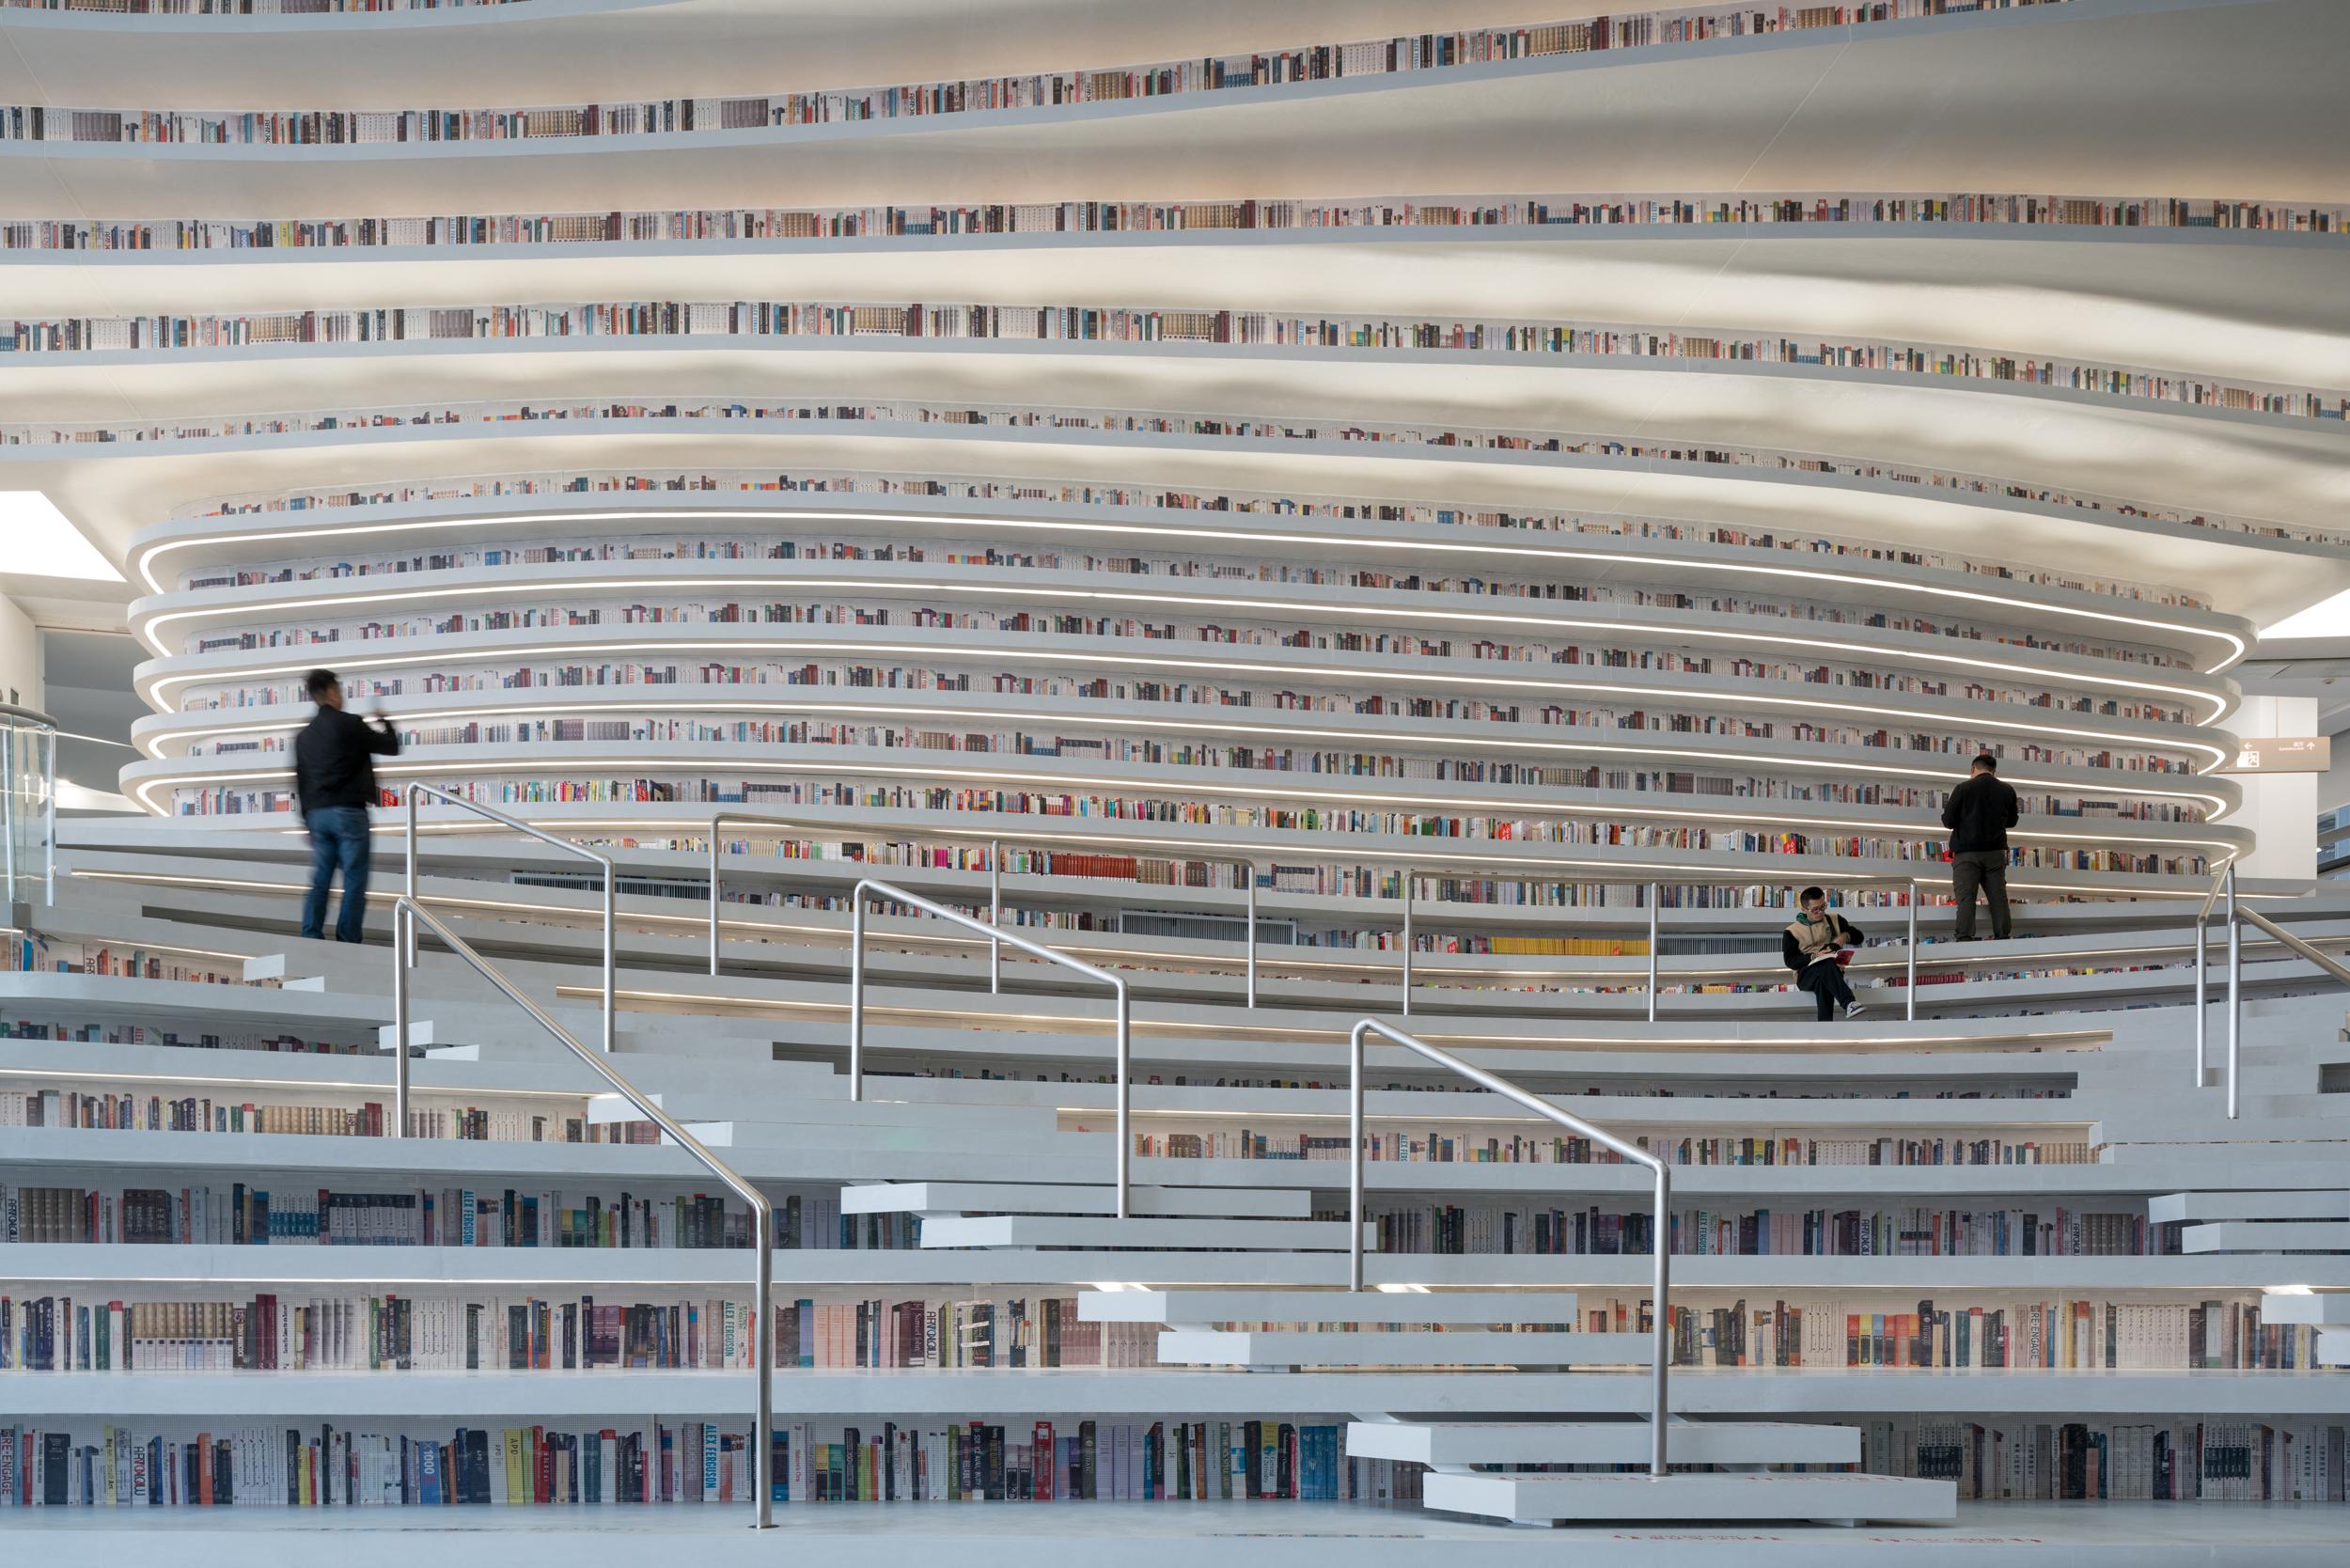 MVRDV Library, Glowing And Undulating, Opens In China